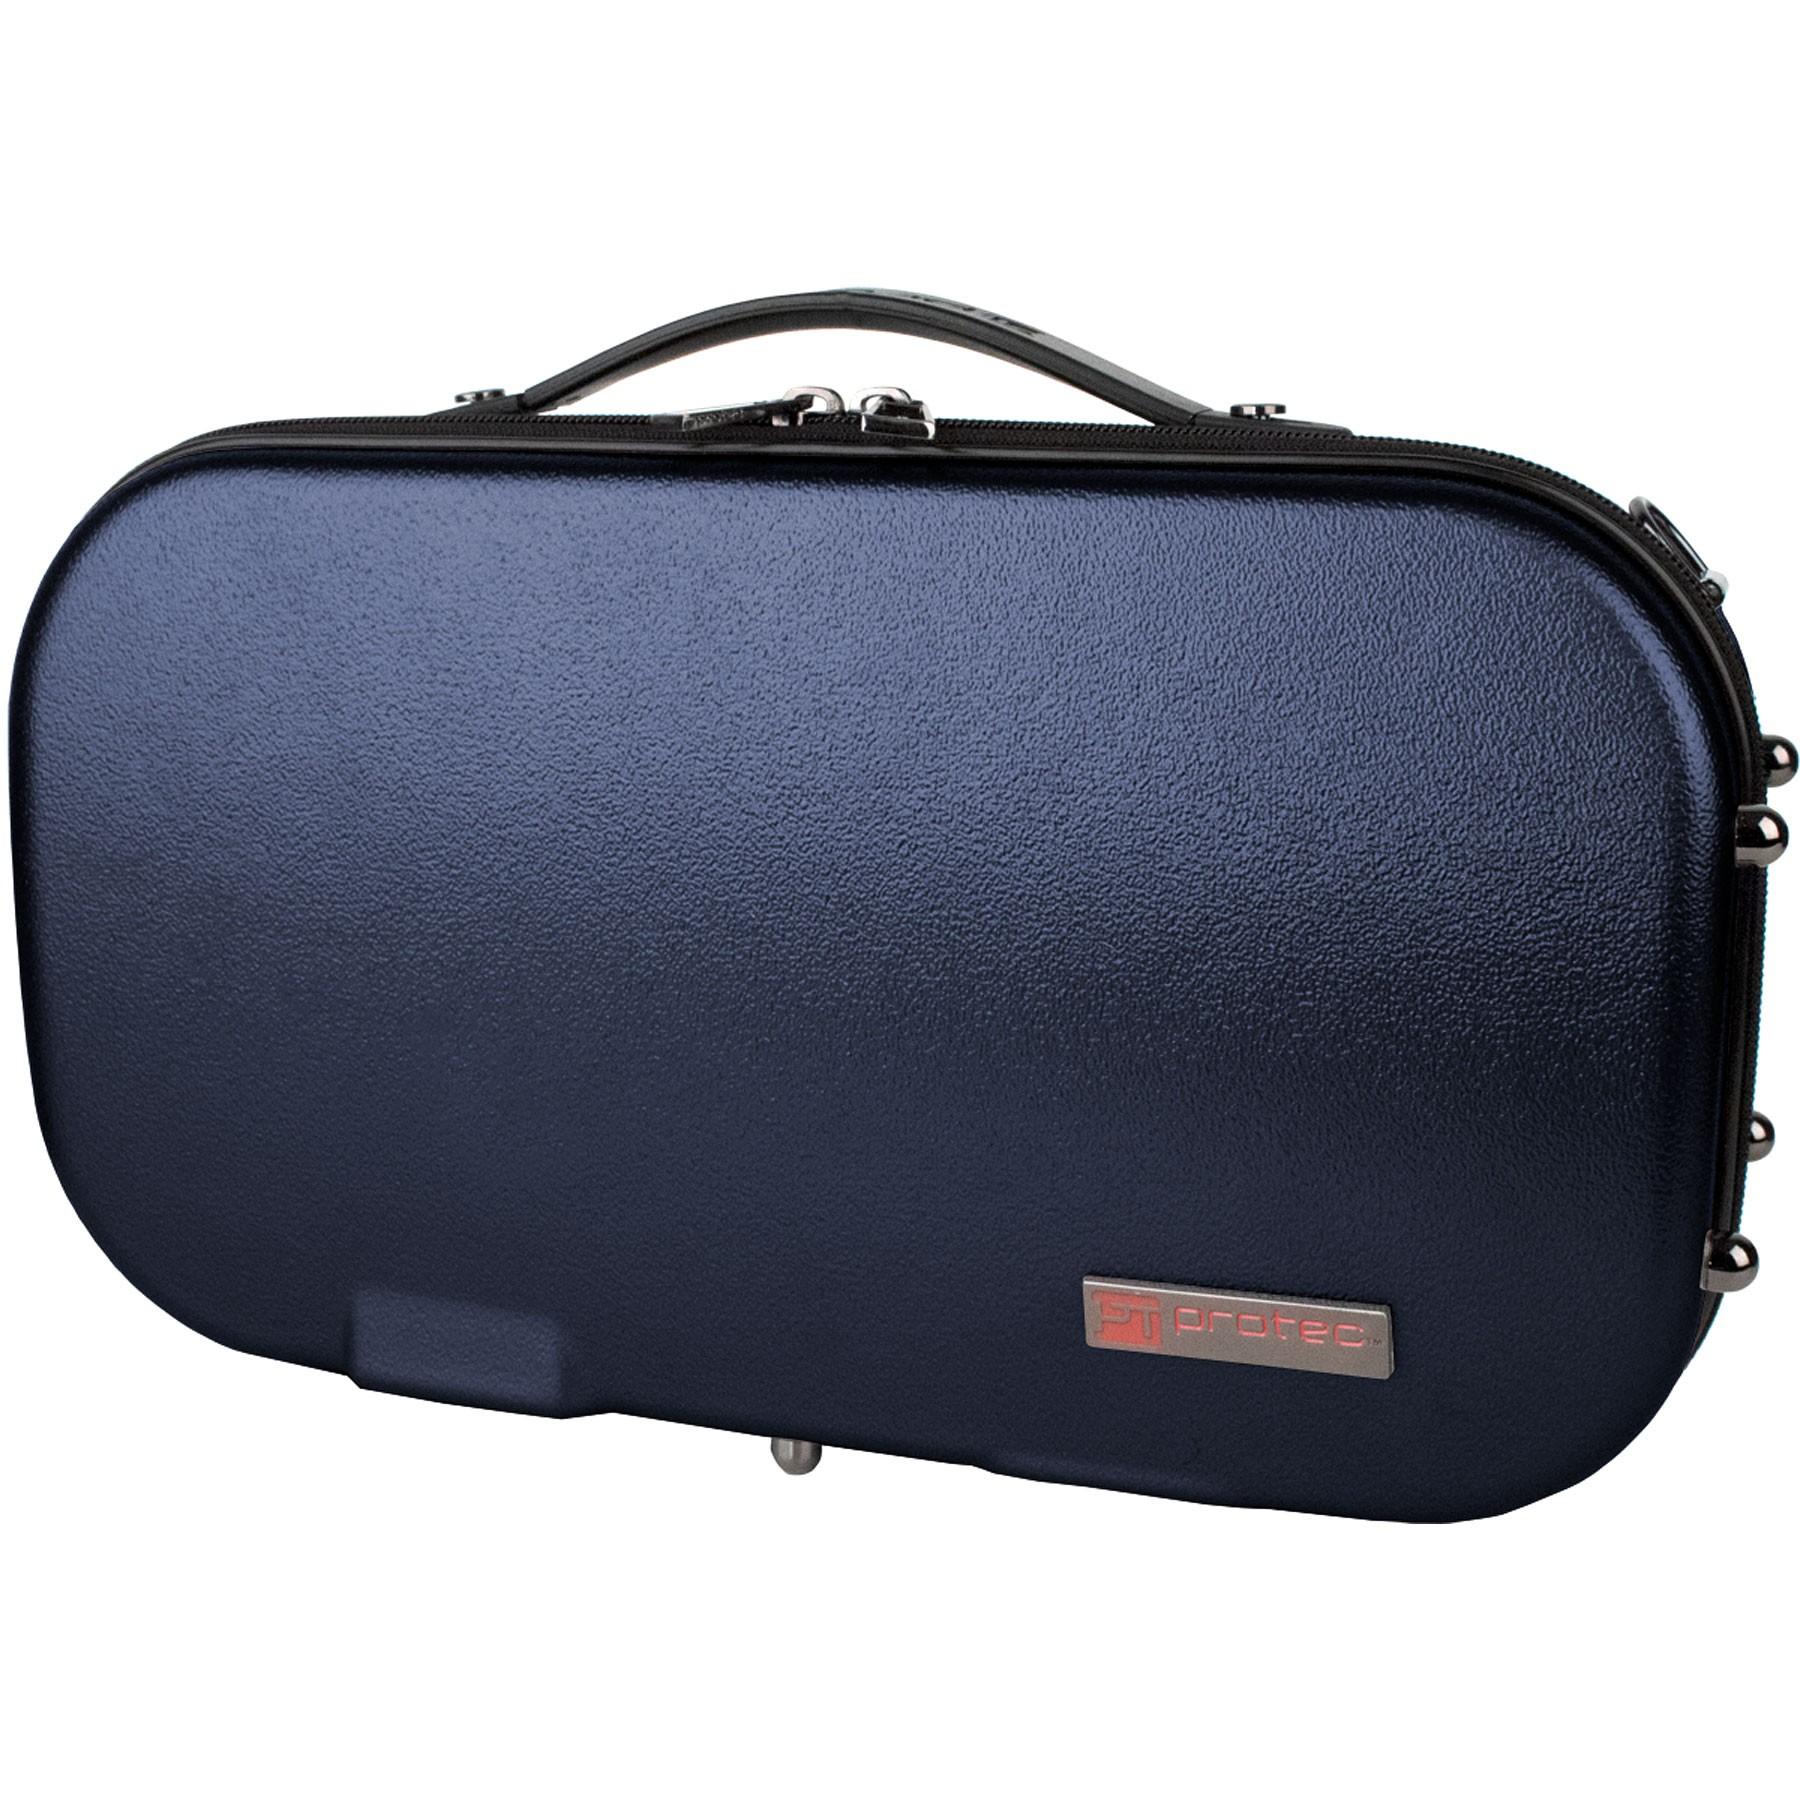 Protec Bb Clarinet Micro ZIP Case (Blue BM307BX)